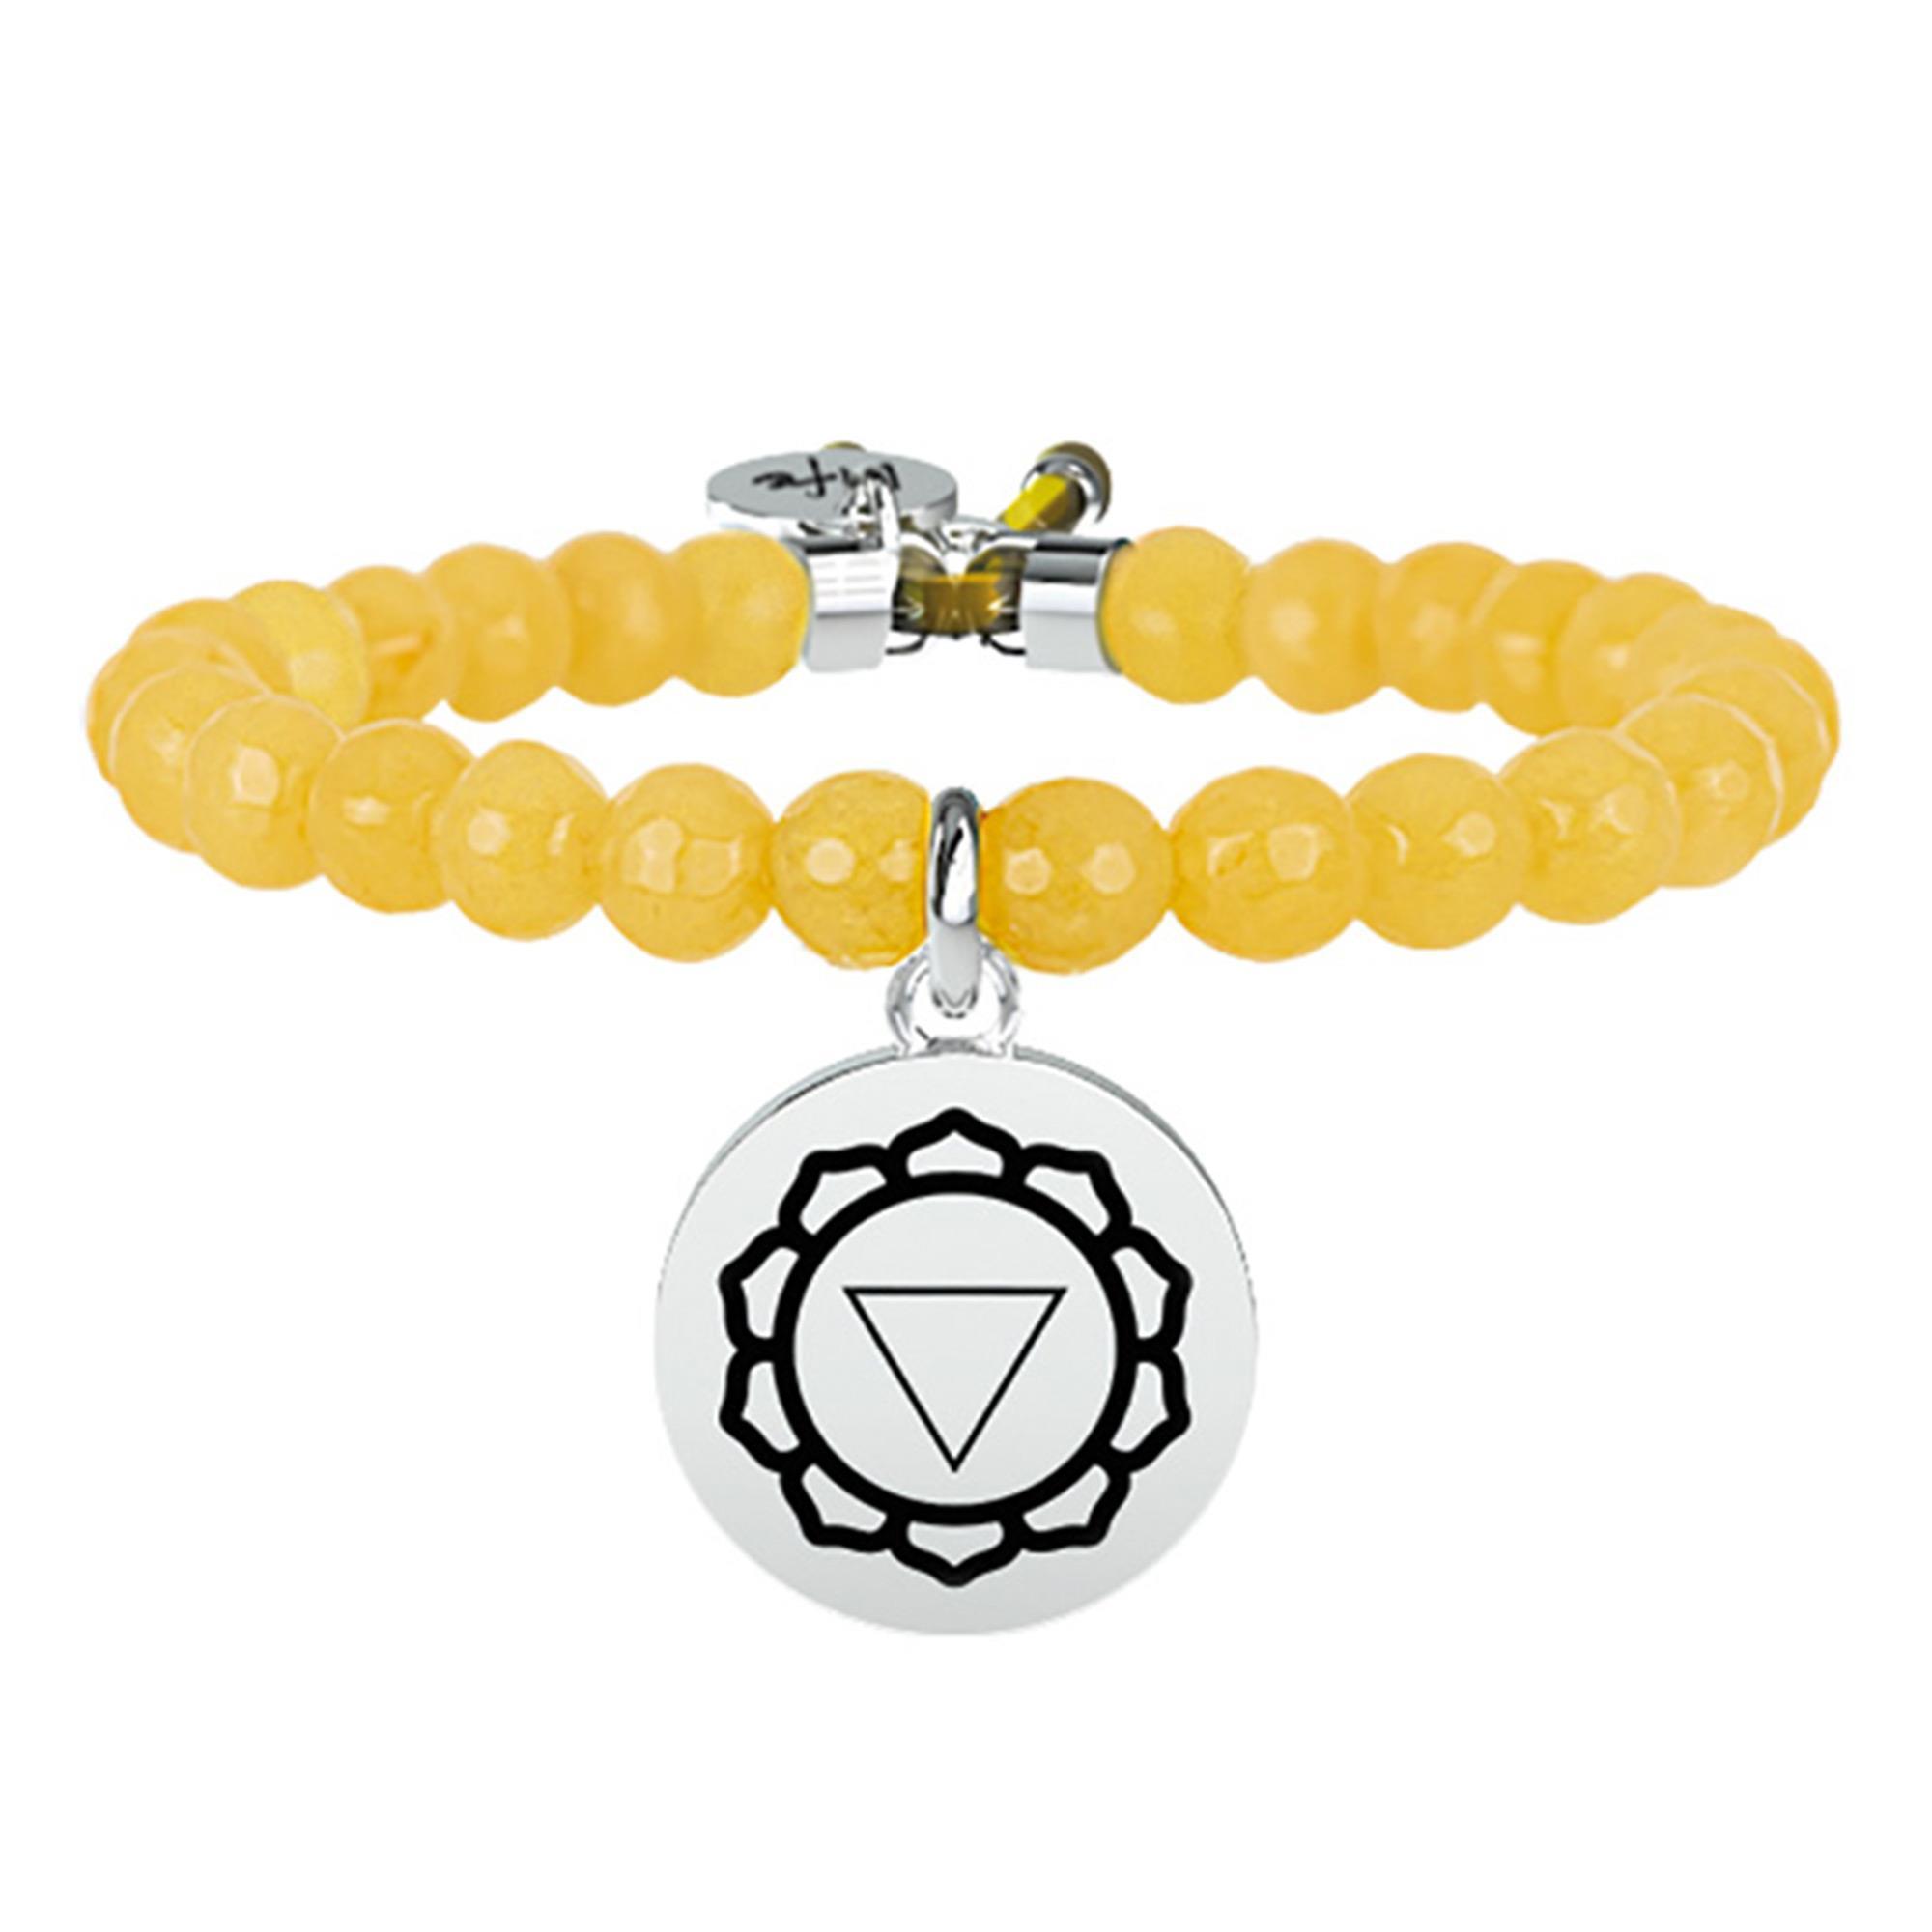 Bracciale Spirituality III Chakra Giada Giallo - KIDULT